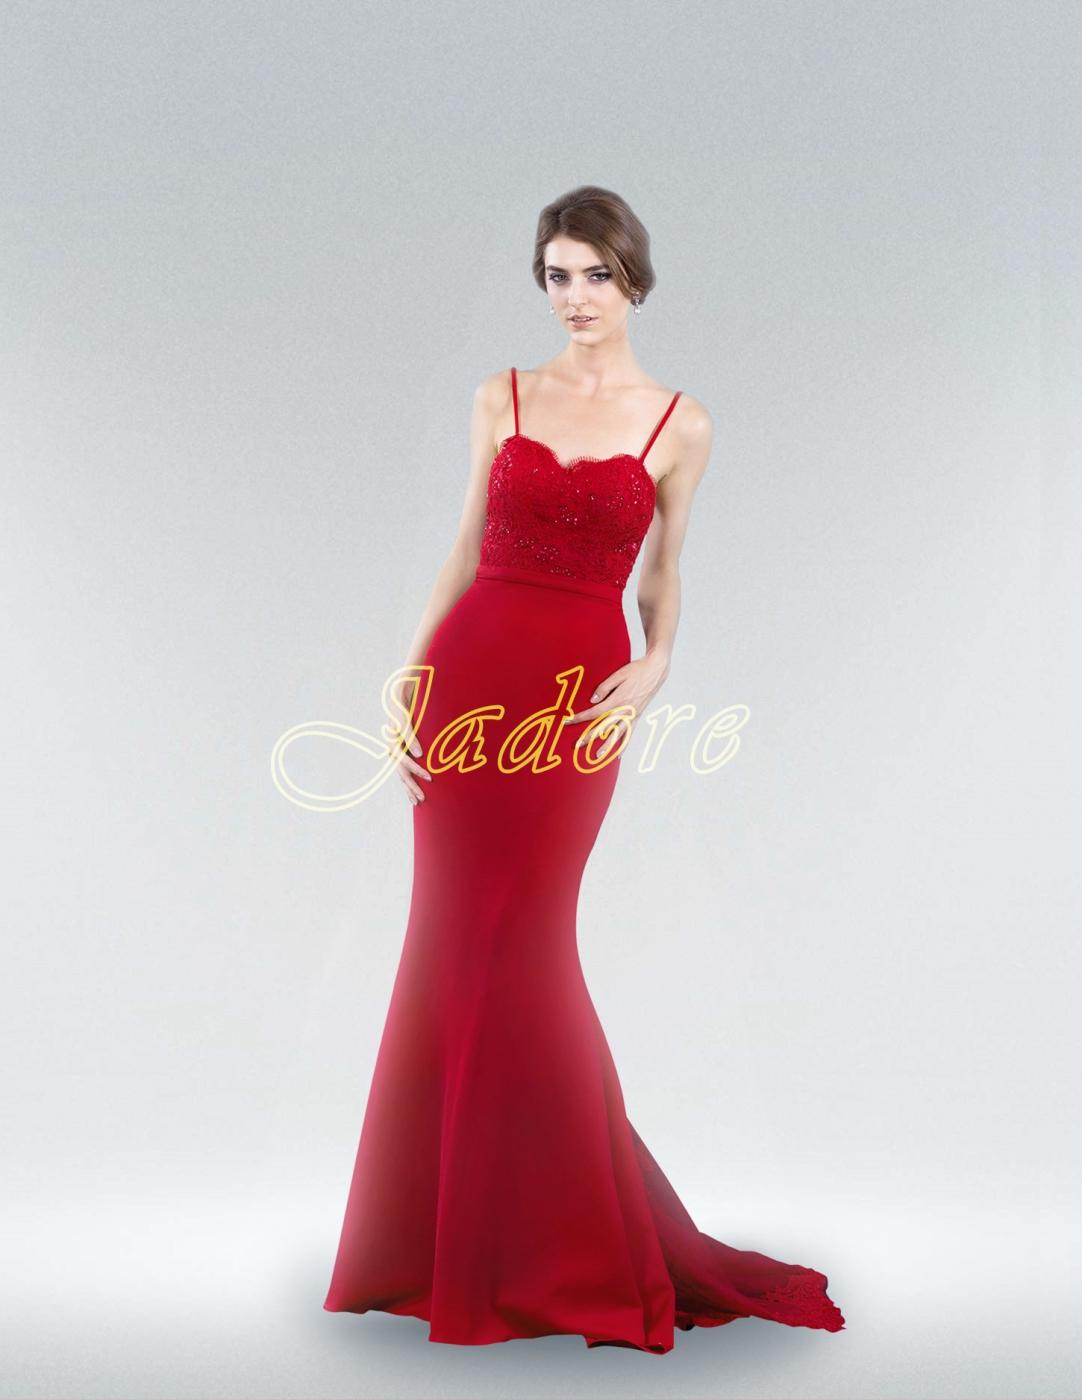 222bd0f236f Prom Dress by Jadore Jadore J8 Collection - JC8034